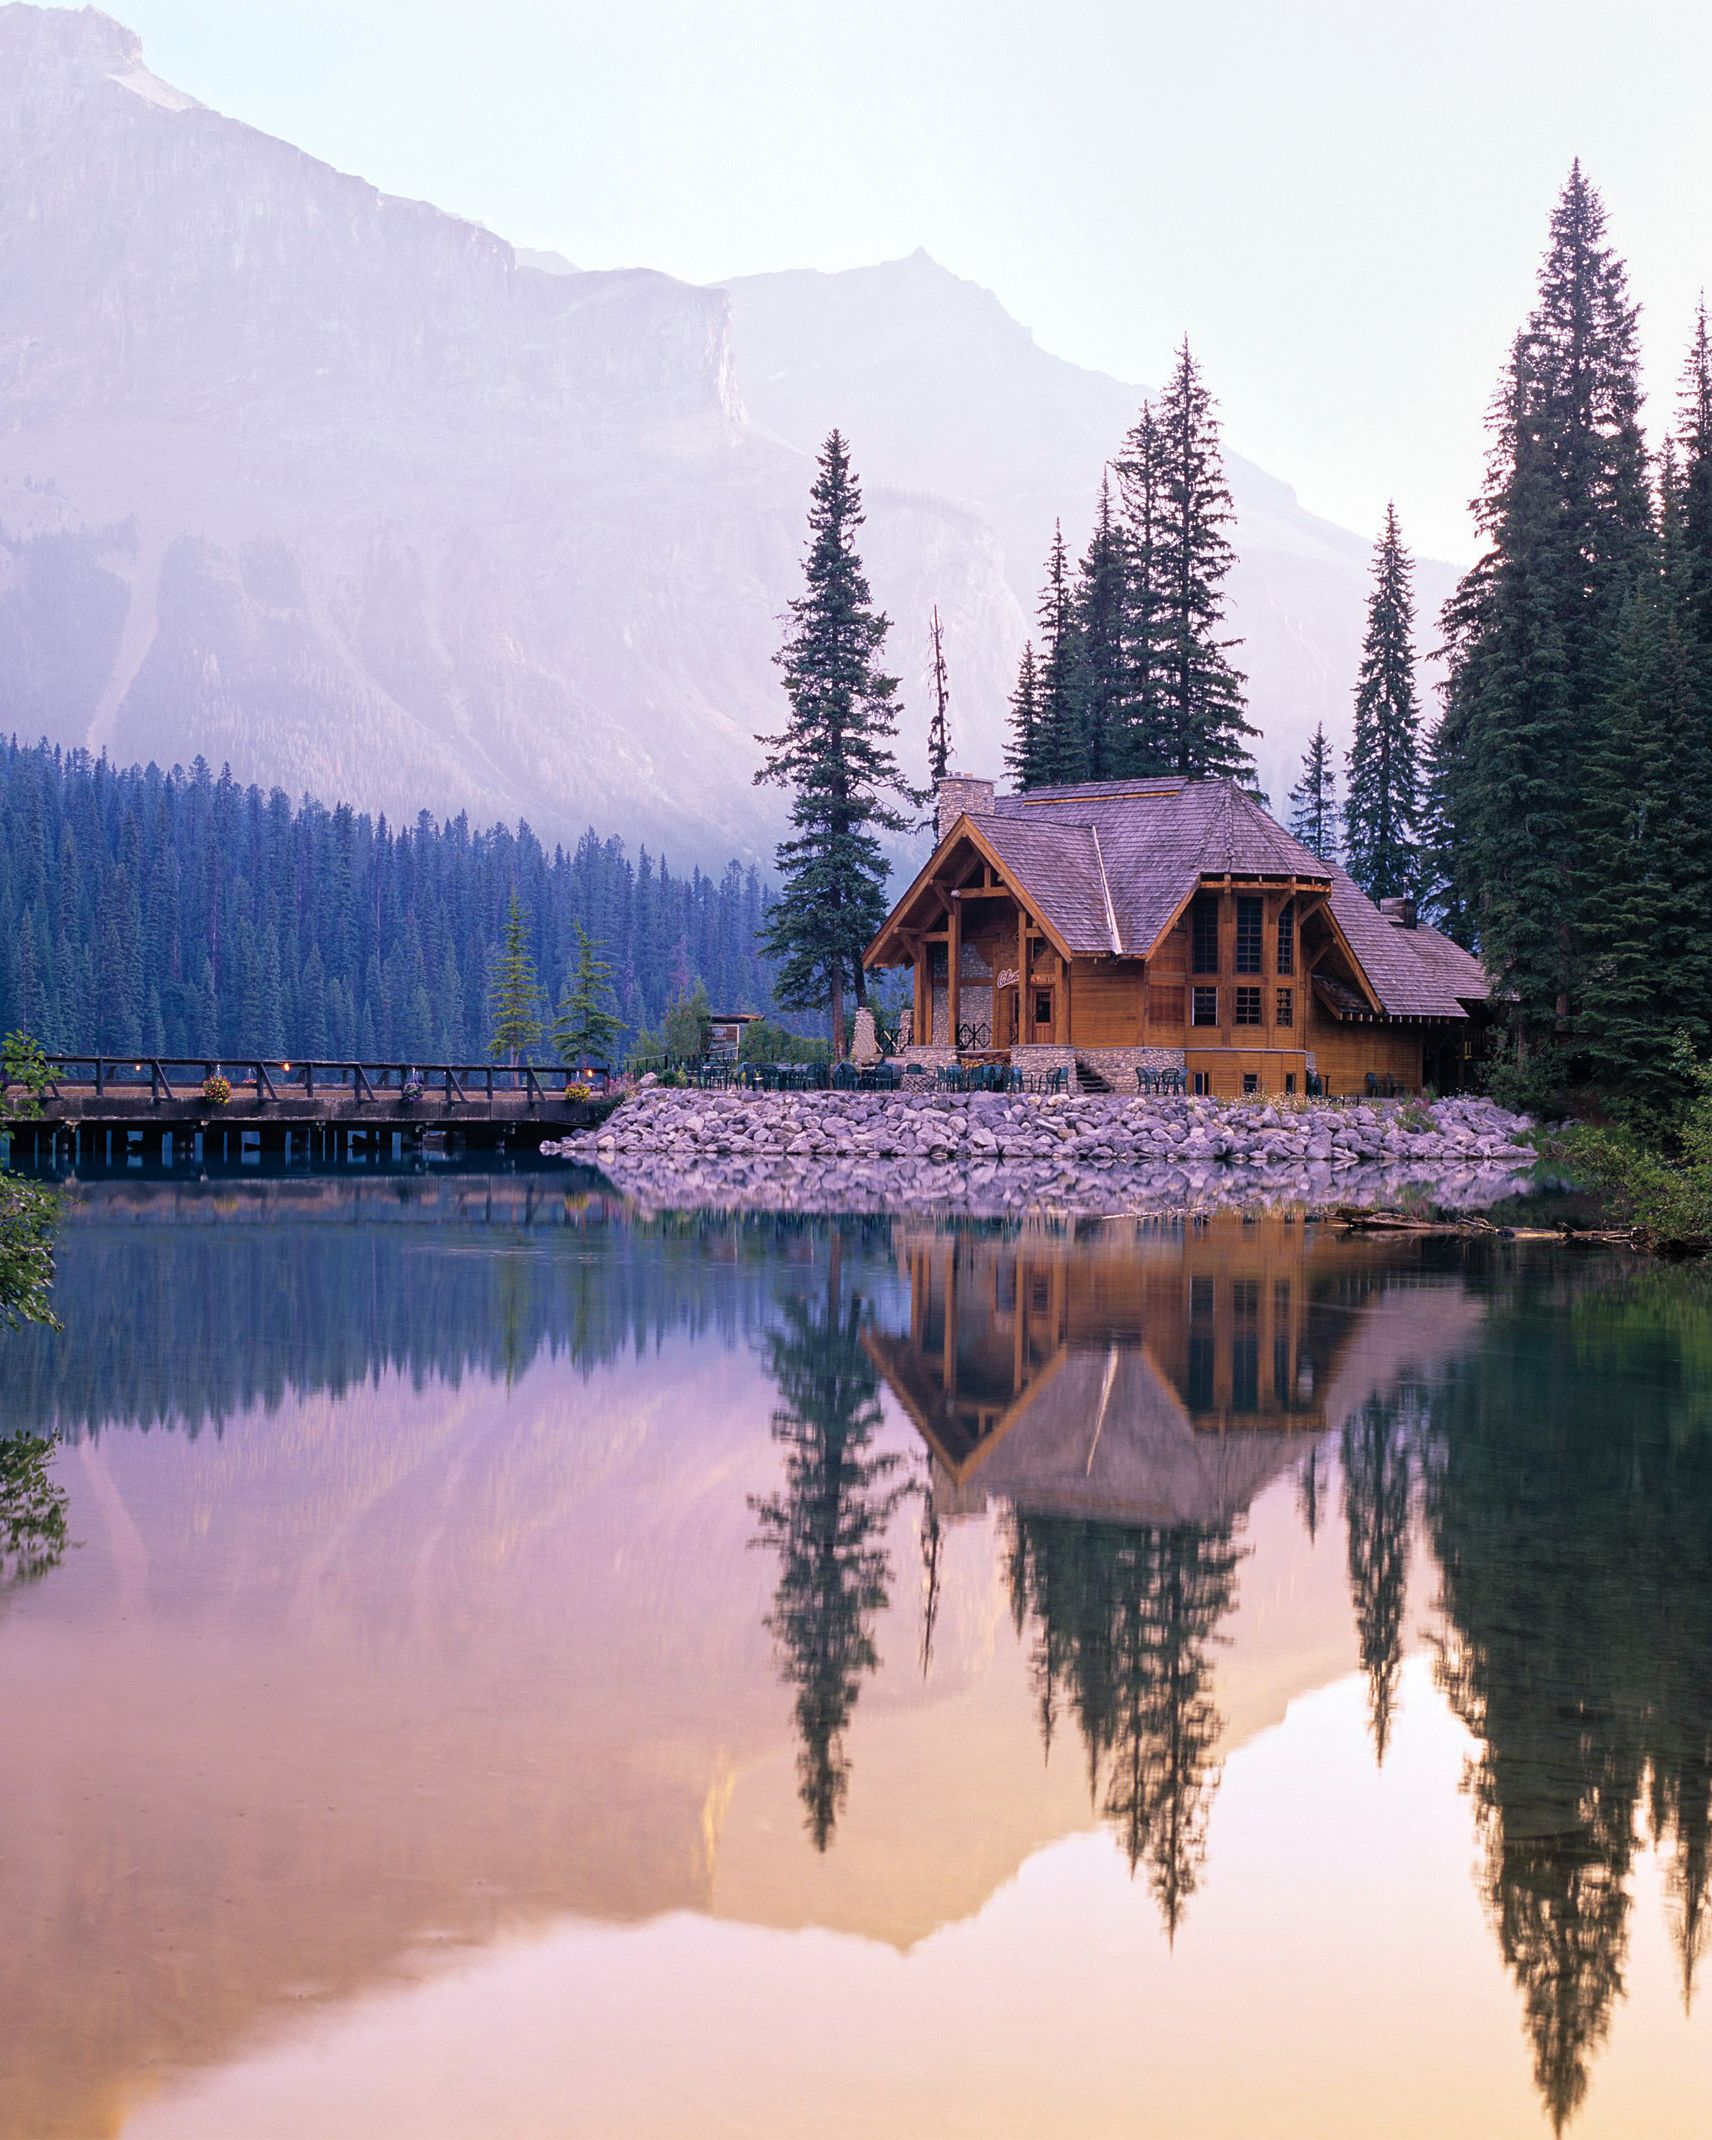 Emerald Lake Lodge in British Columbia Is a Stunning Venue